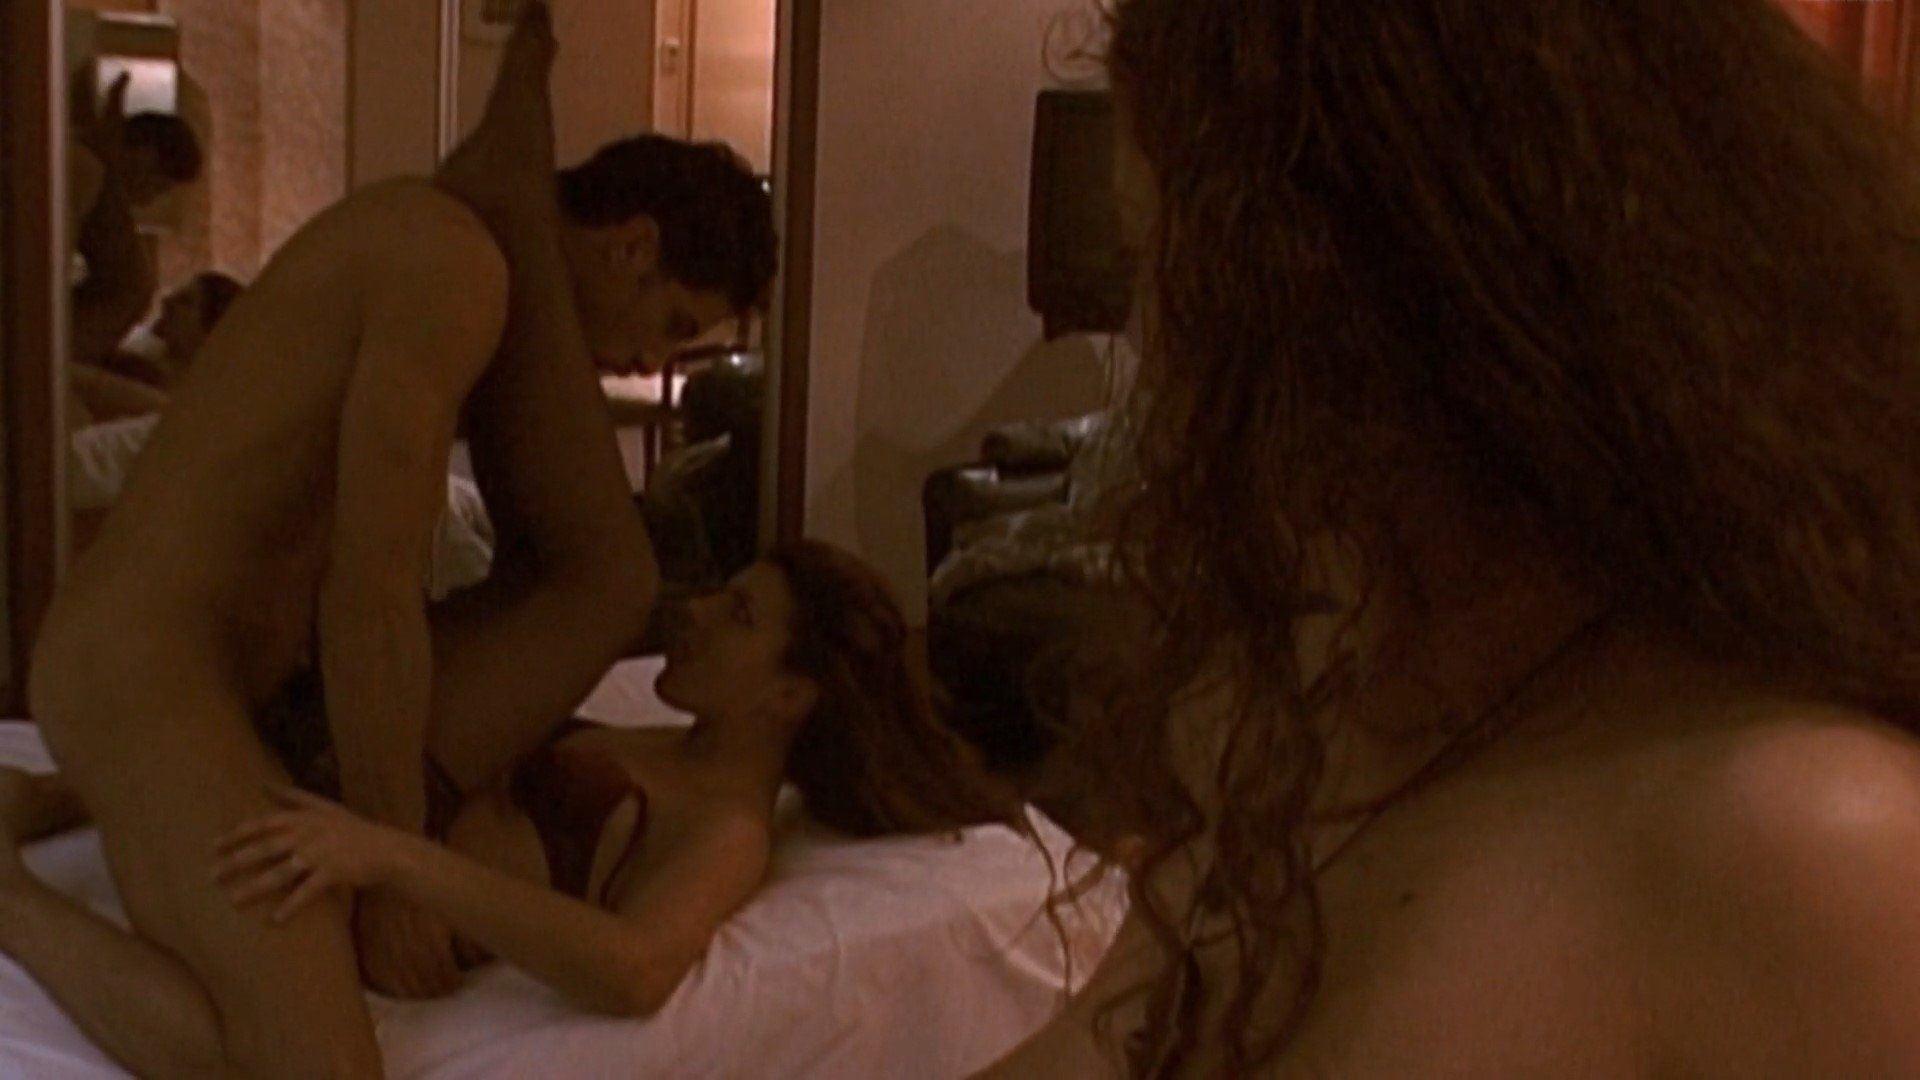 Baise Moi Explicit baise moi naked - hot nude. comments: 1